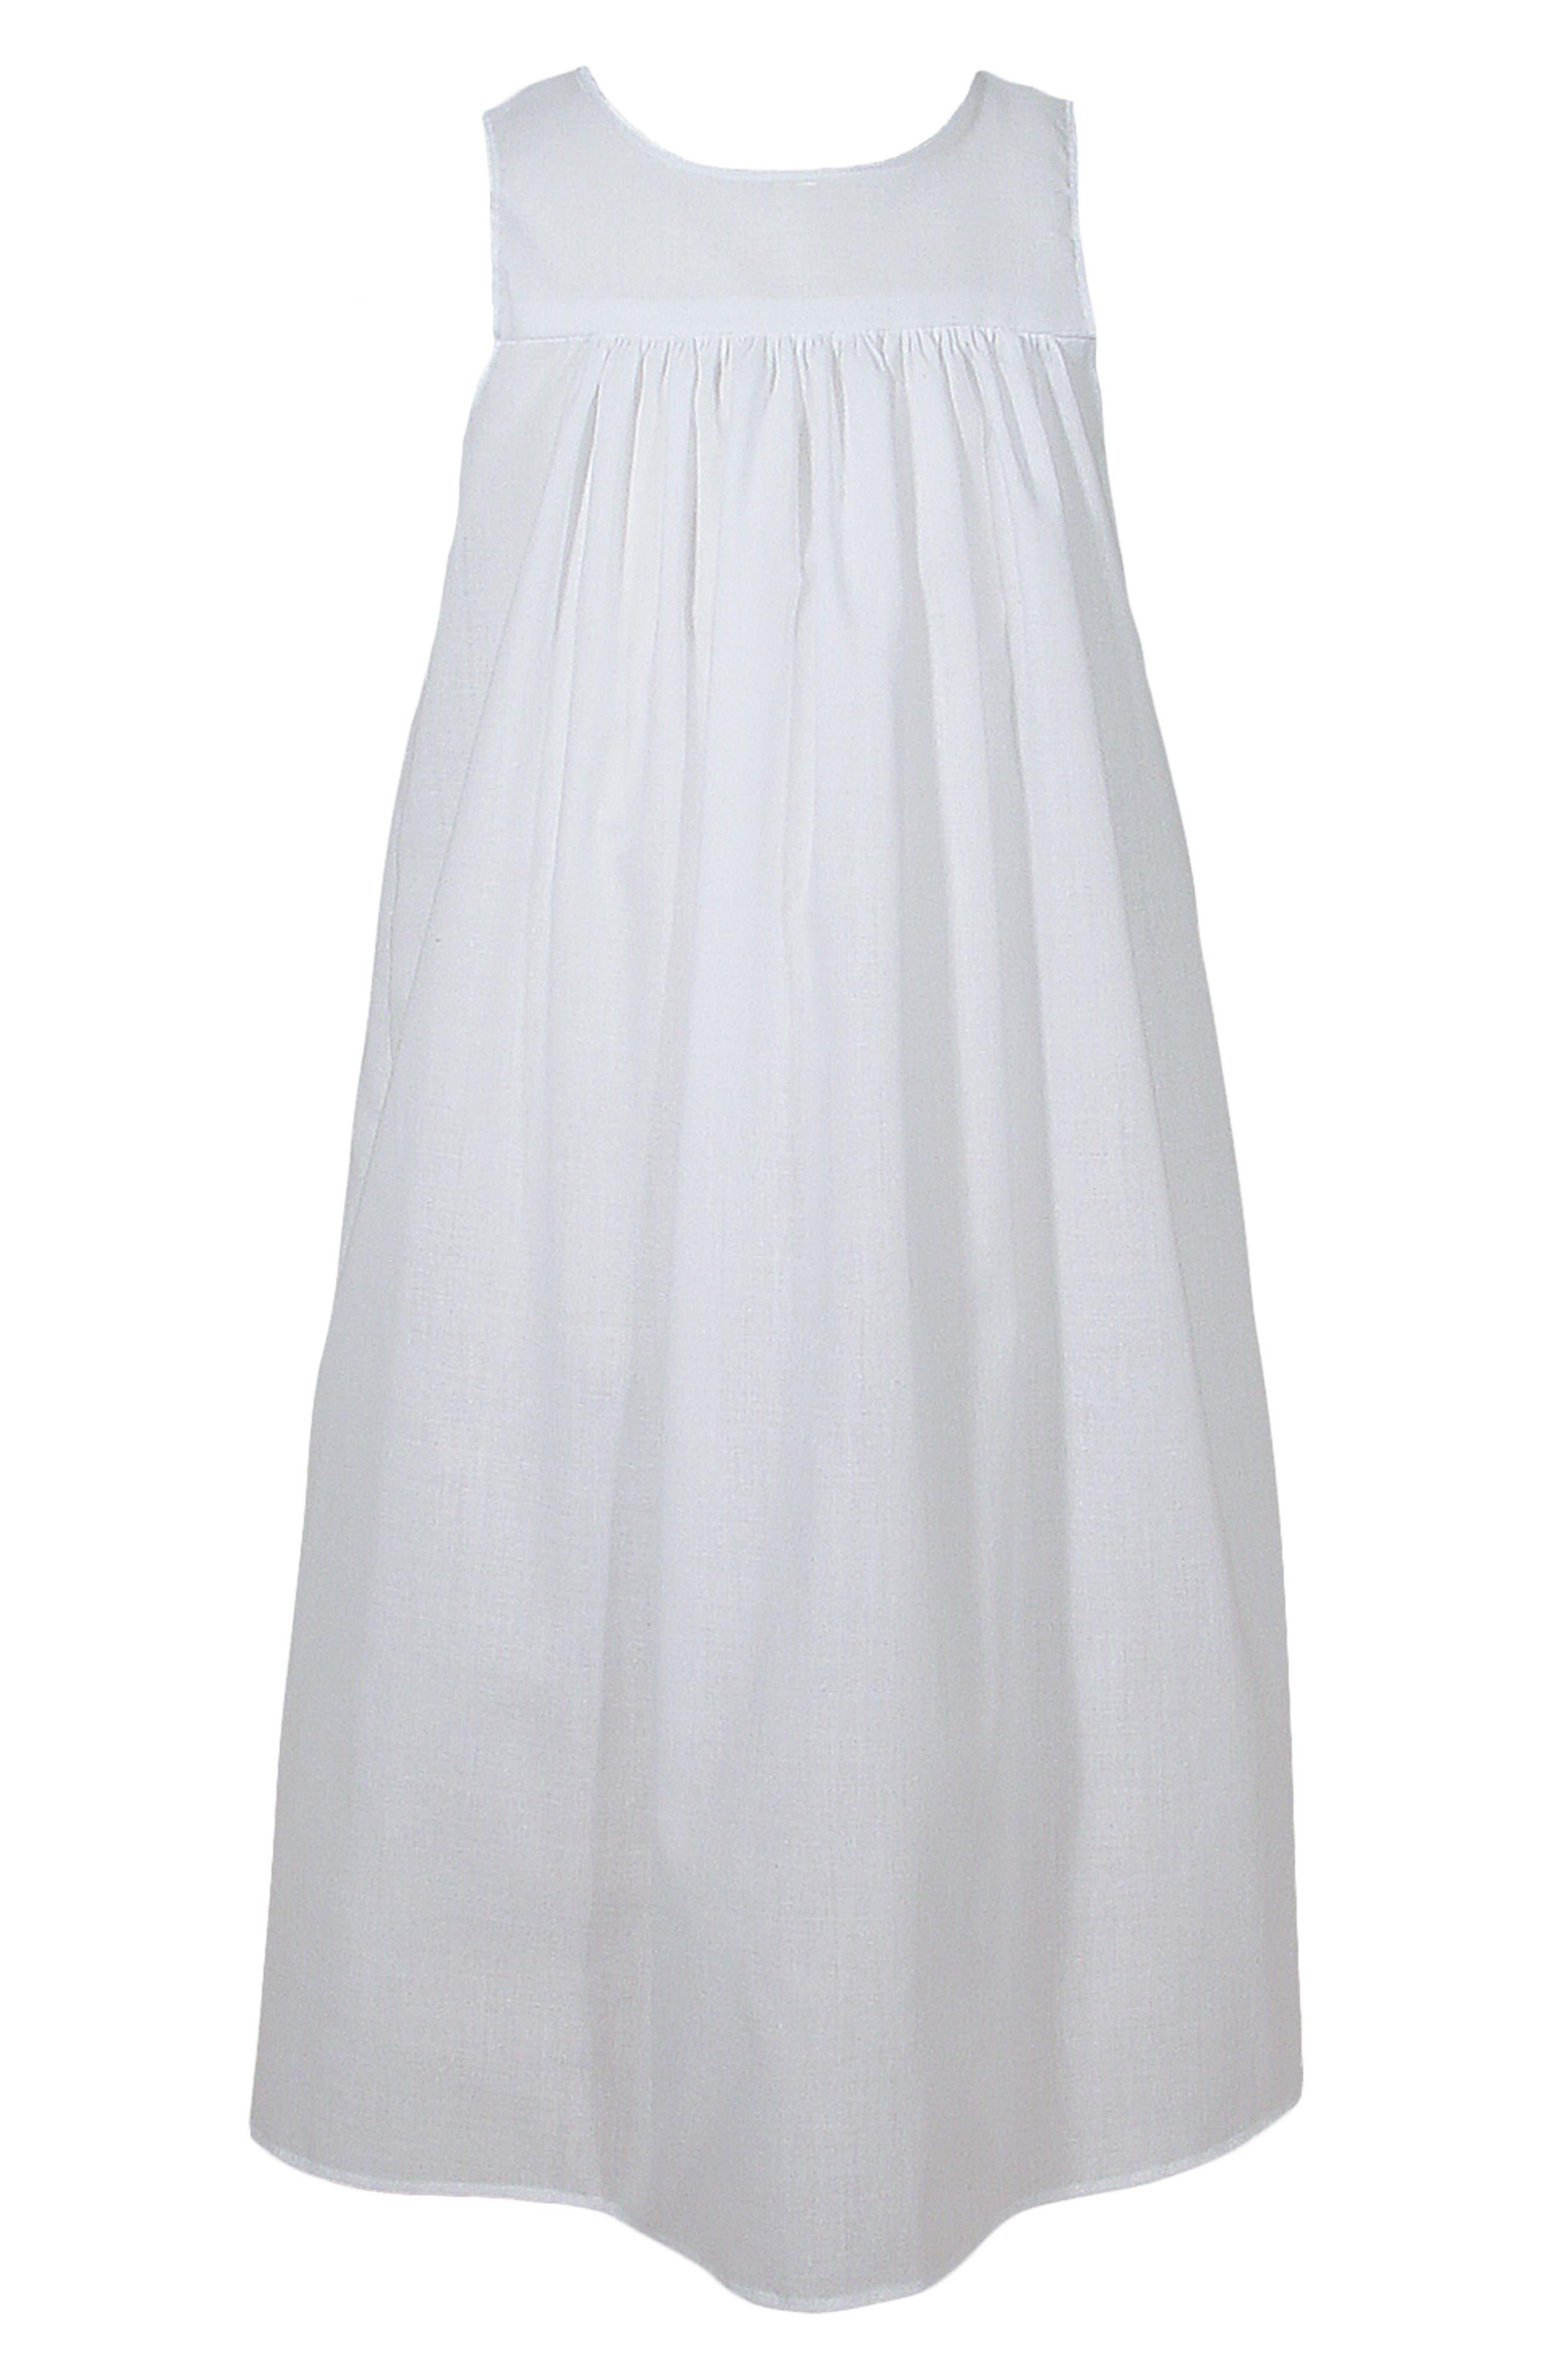 Christening Gown Slip,                         Main,                         color, WHITE